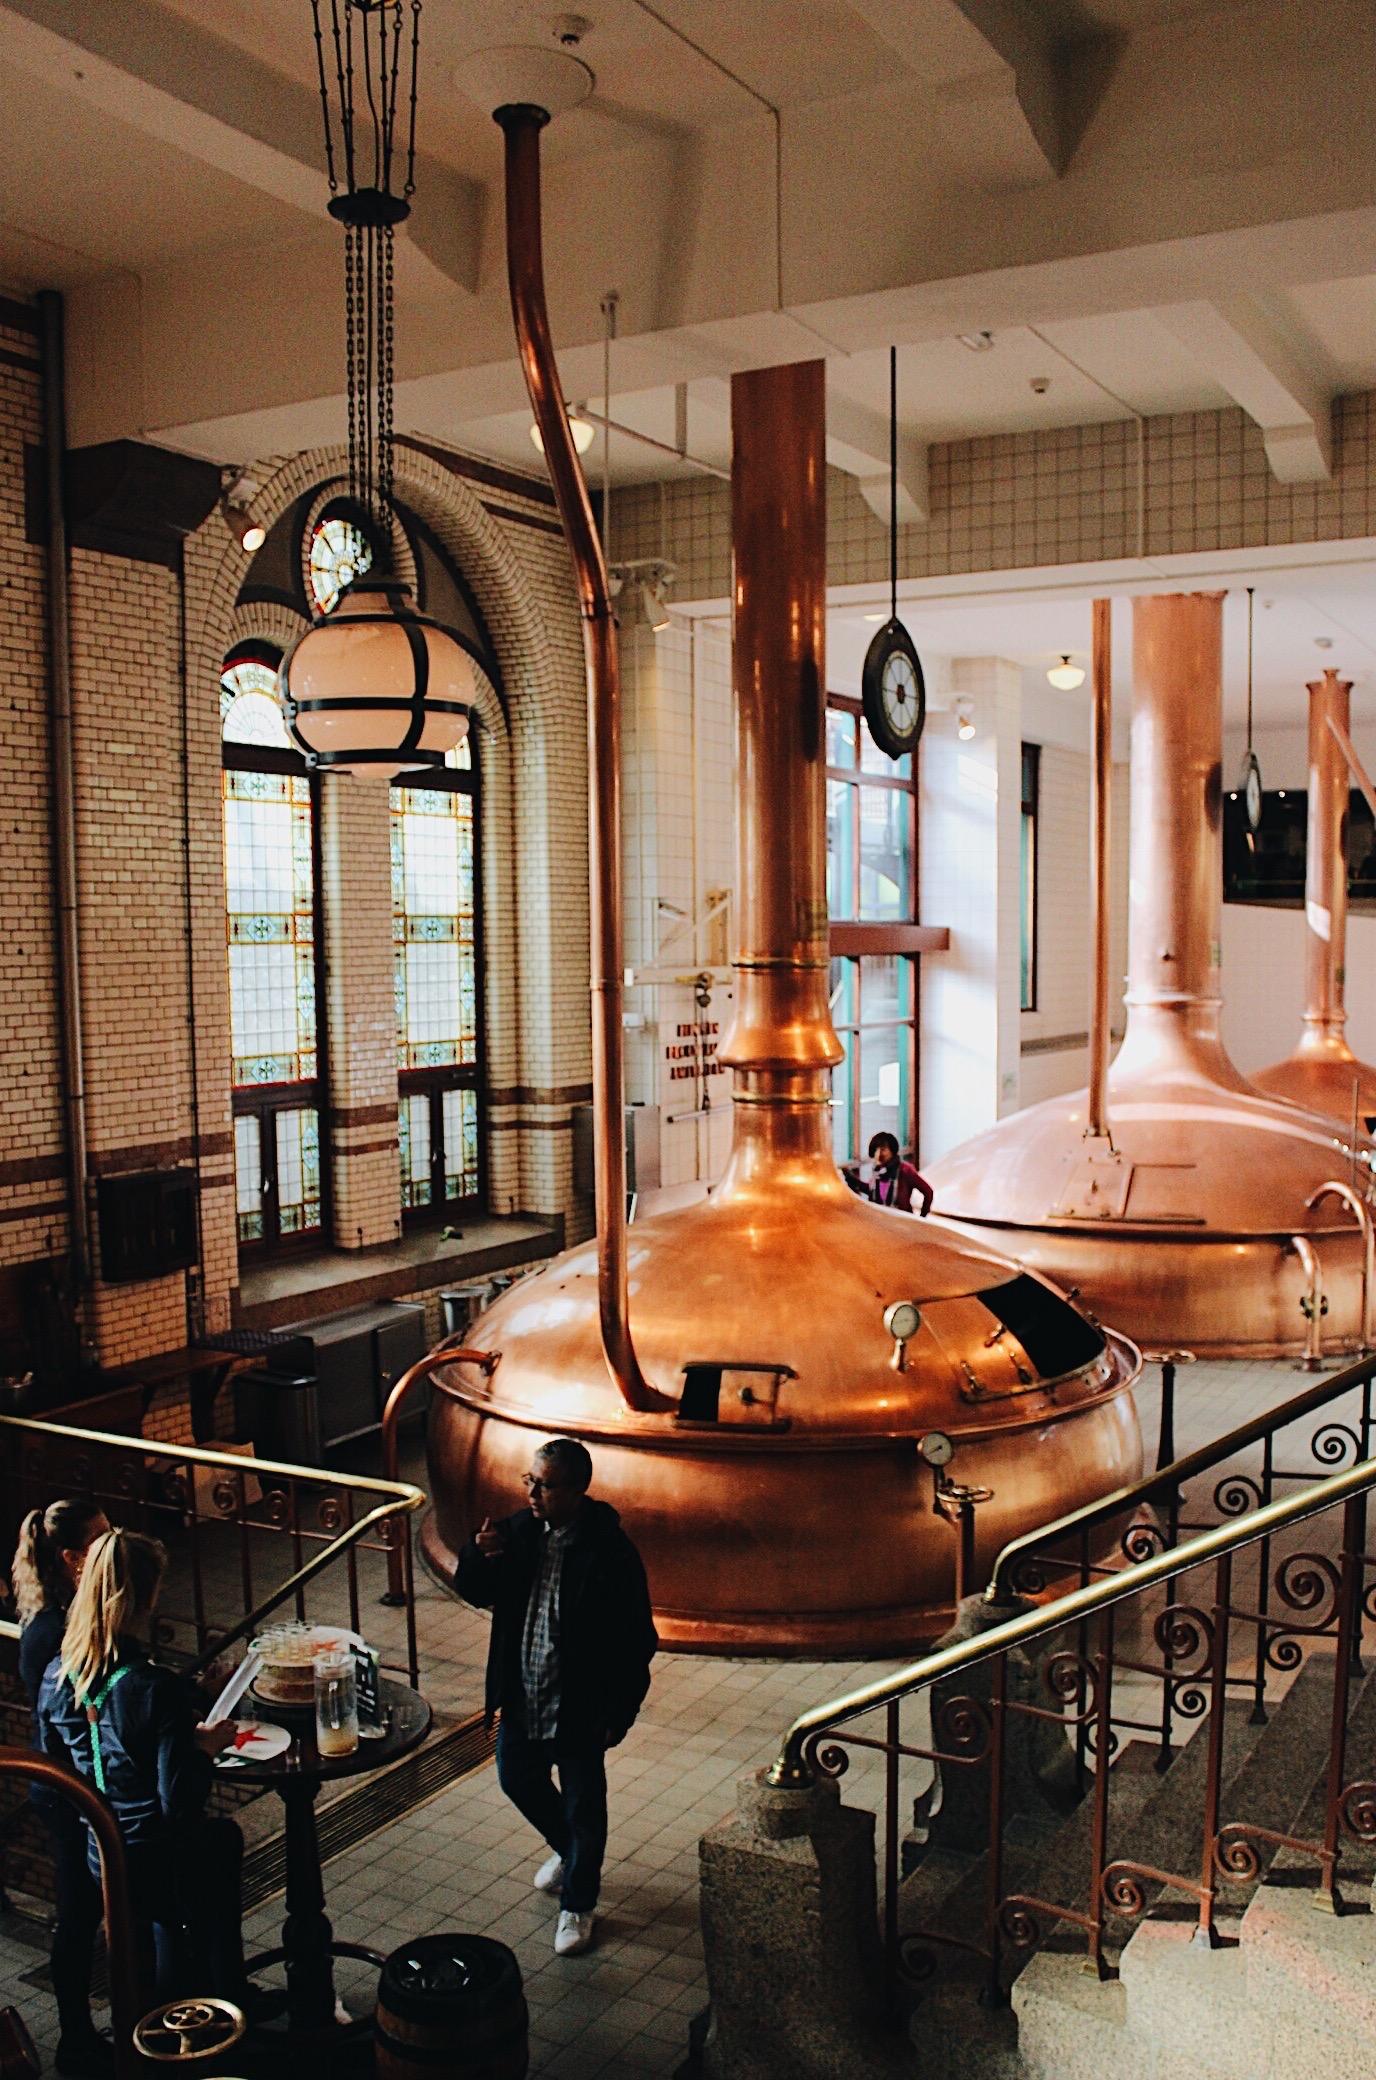 Inside of the Heineken Factory during your weekend in Amsterdam